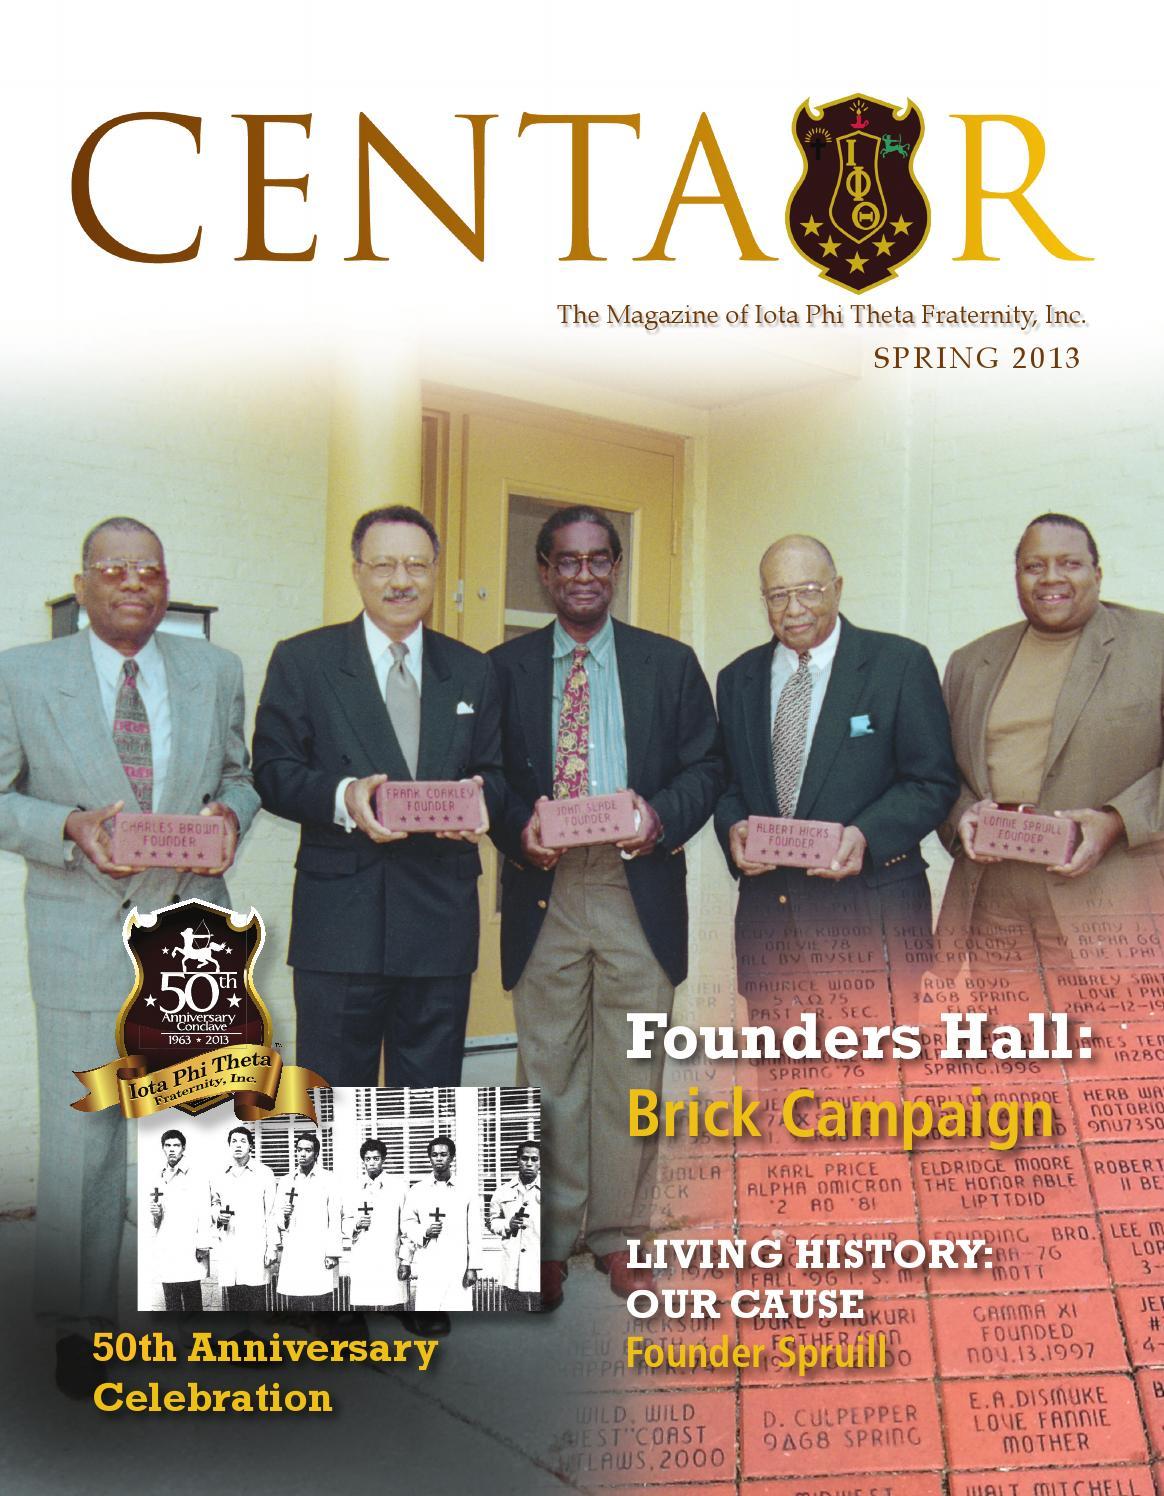 5a4982674b062 Centaur spring 2013. The Centaur is the official publication of Iota Phi  Theta ...